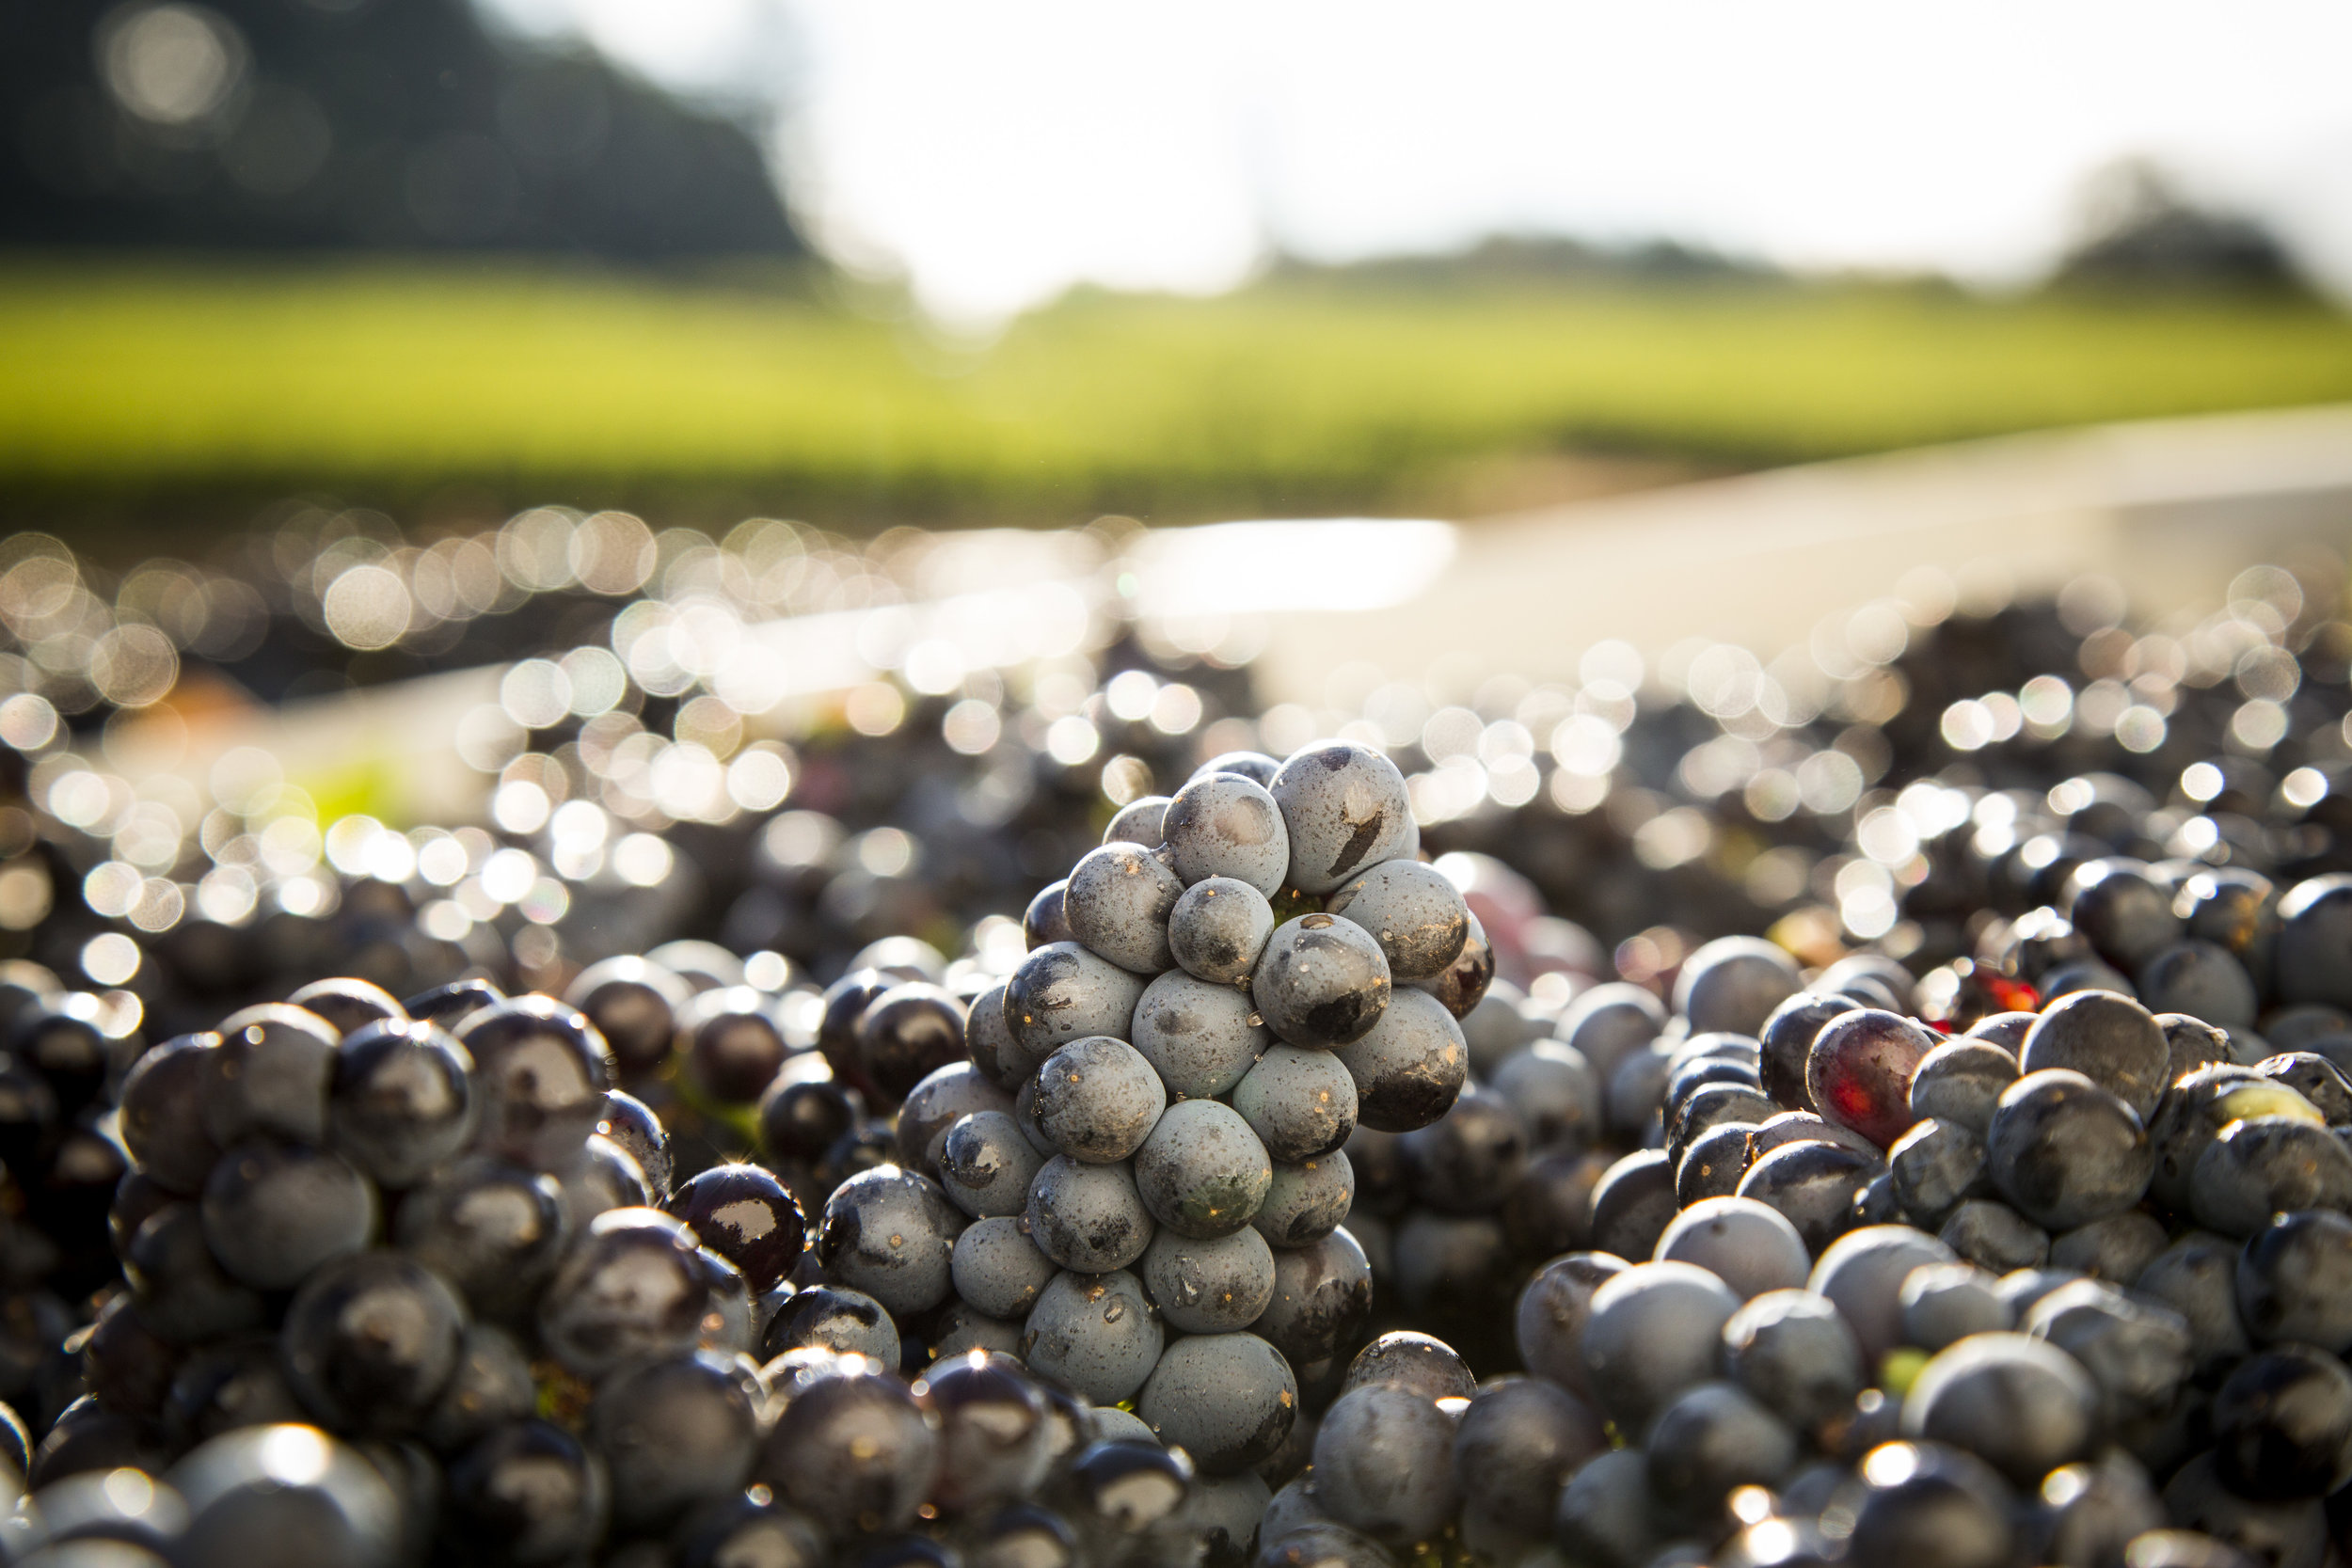 Adelsheim Grapes in Vineyard